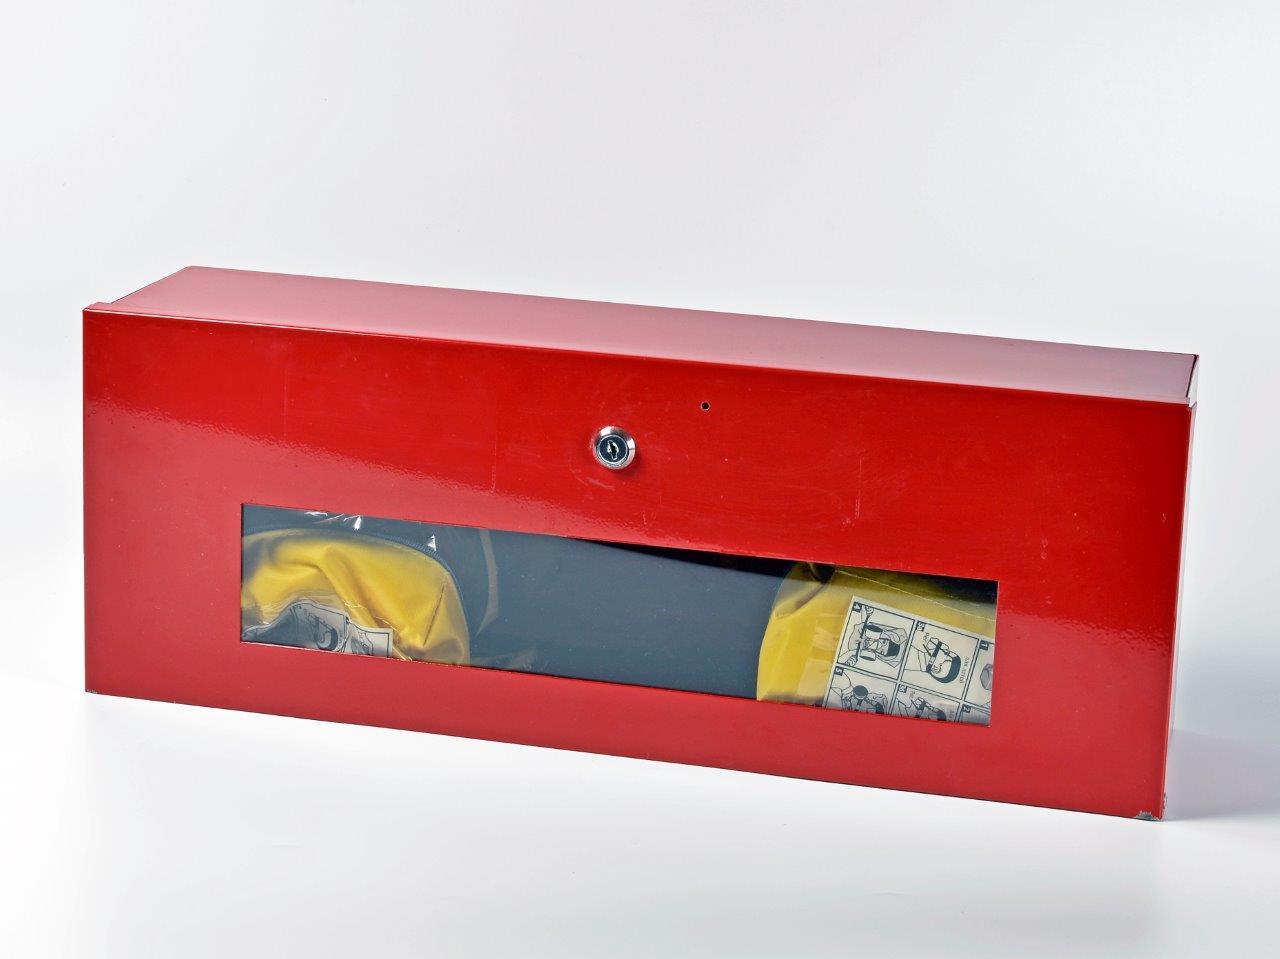 Контейнер для самоспасателей и наборов ШАНС-Е ШАНС-2, ШАНС-3